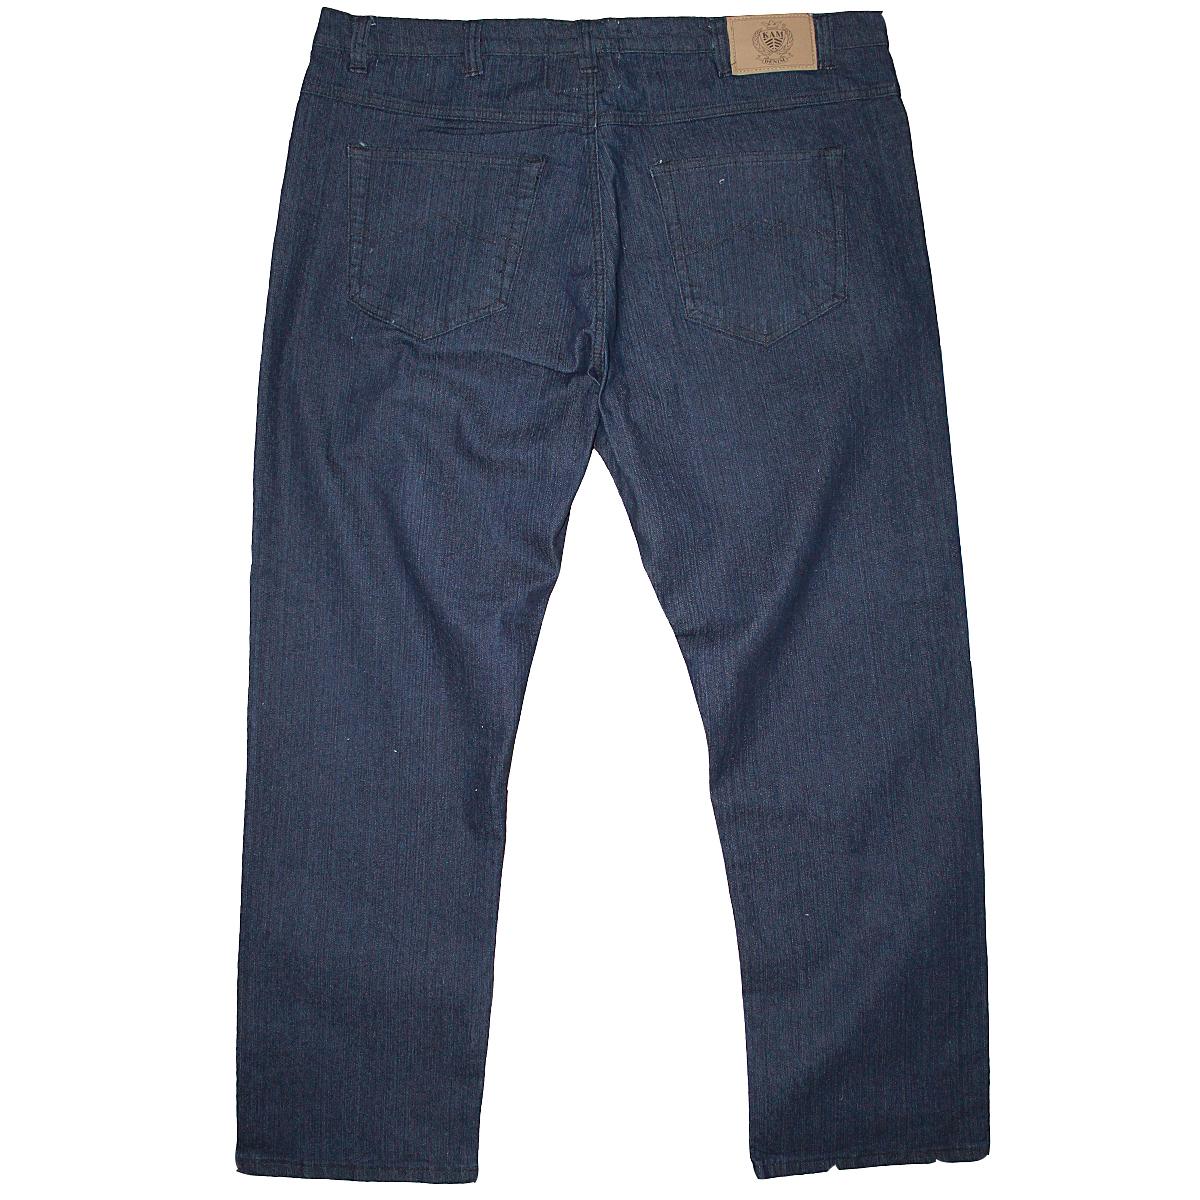 KAM-JEANS-BLUE-MENS-REGULAR-FIT-KBS-101-C-JEANS-ALL-WAIST-AND-LEG-BIG-KING-SIZE